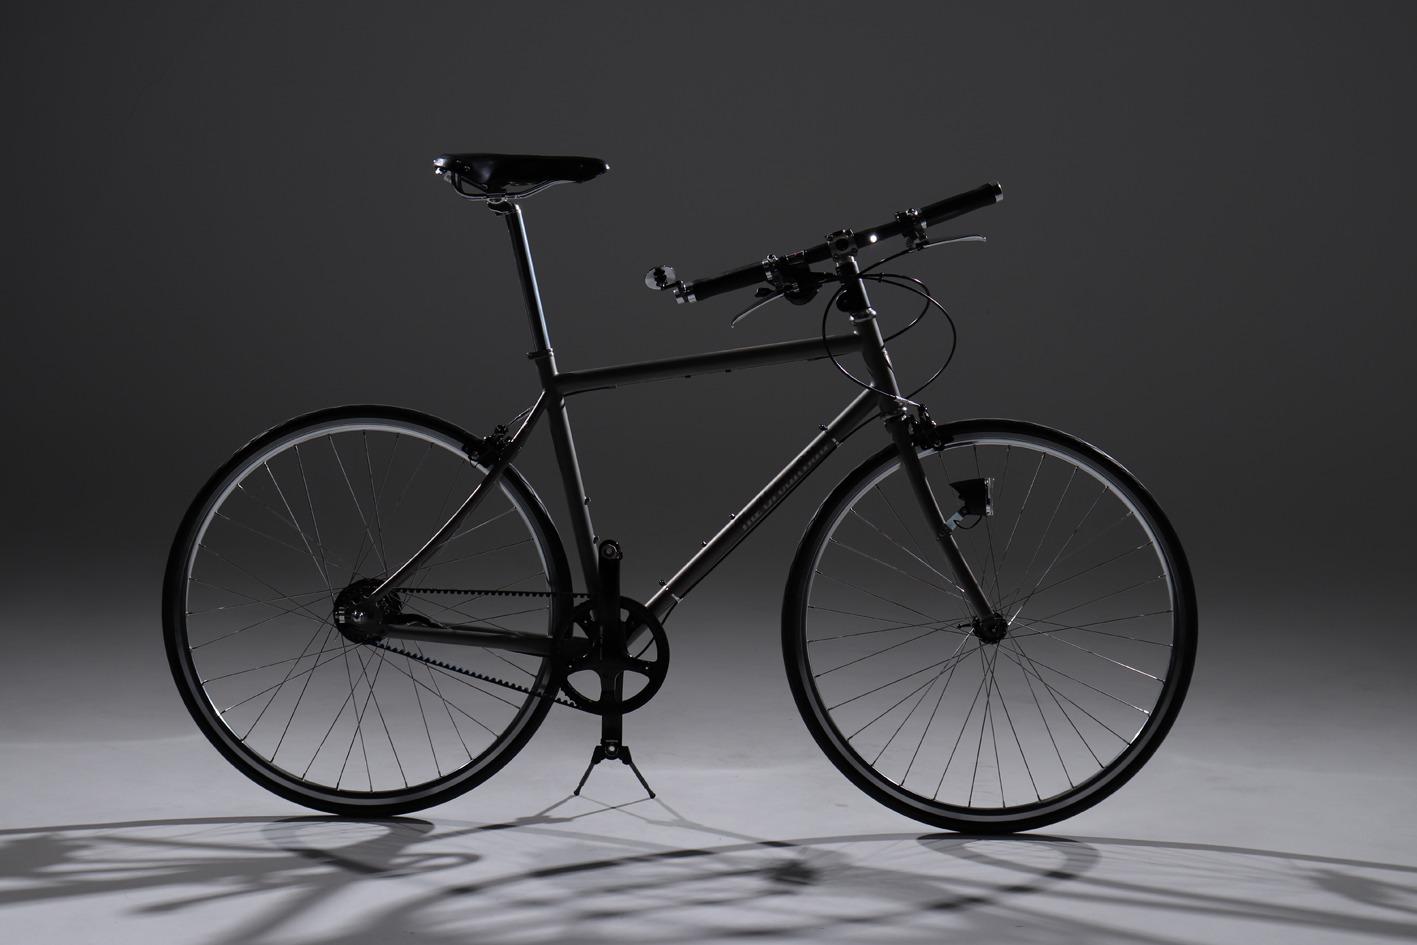 Bicycle shop Japan